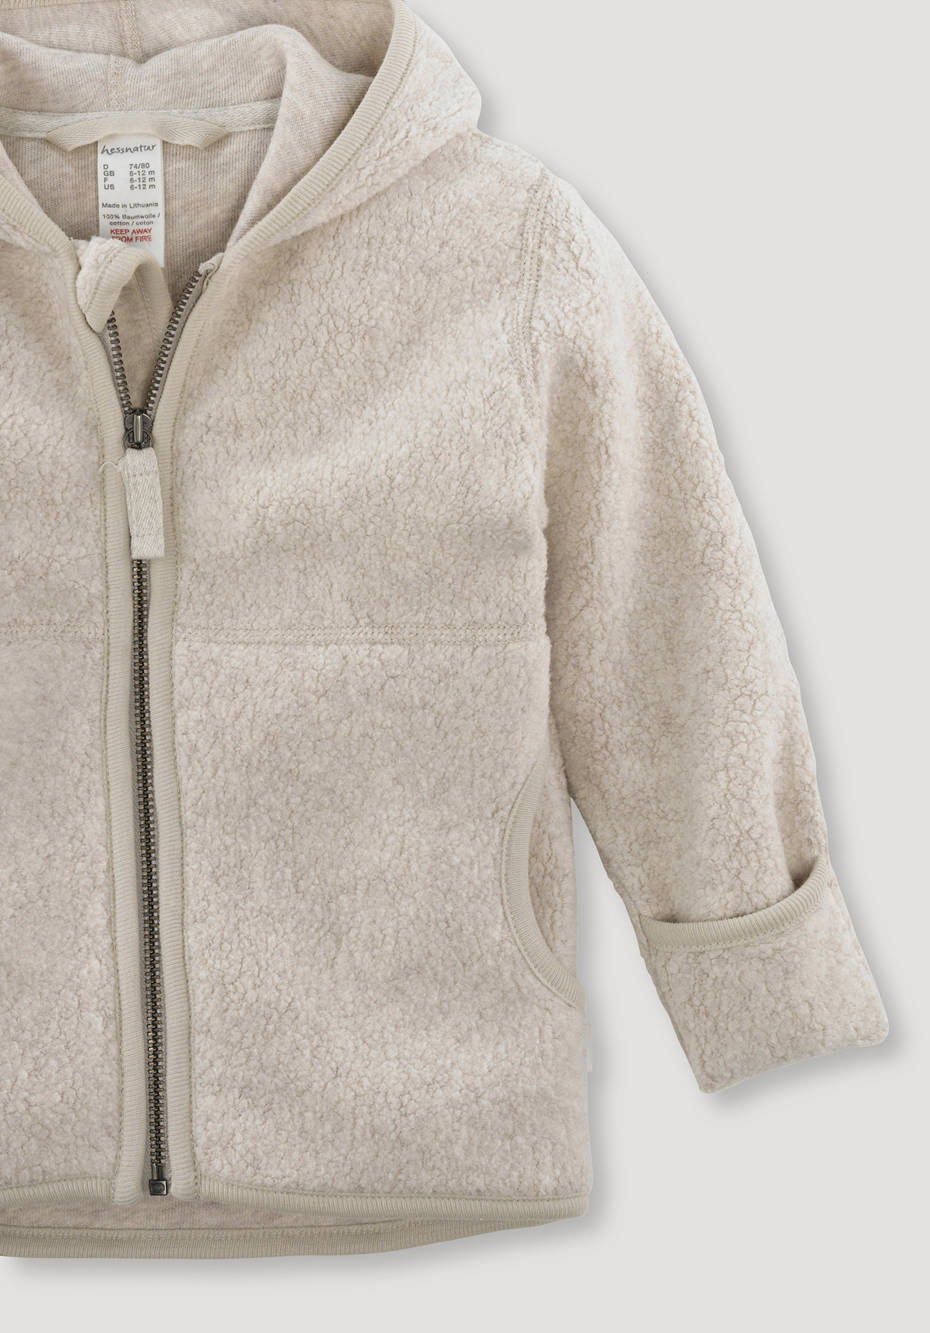 Fleece jacket made of pure organic cotton